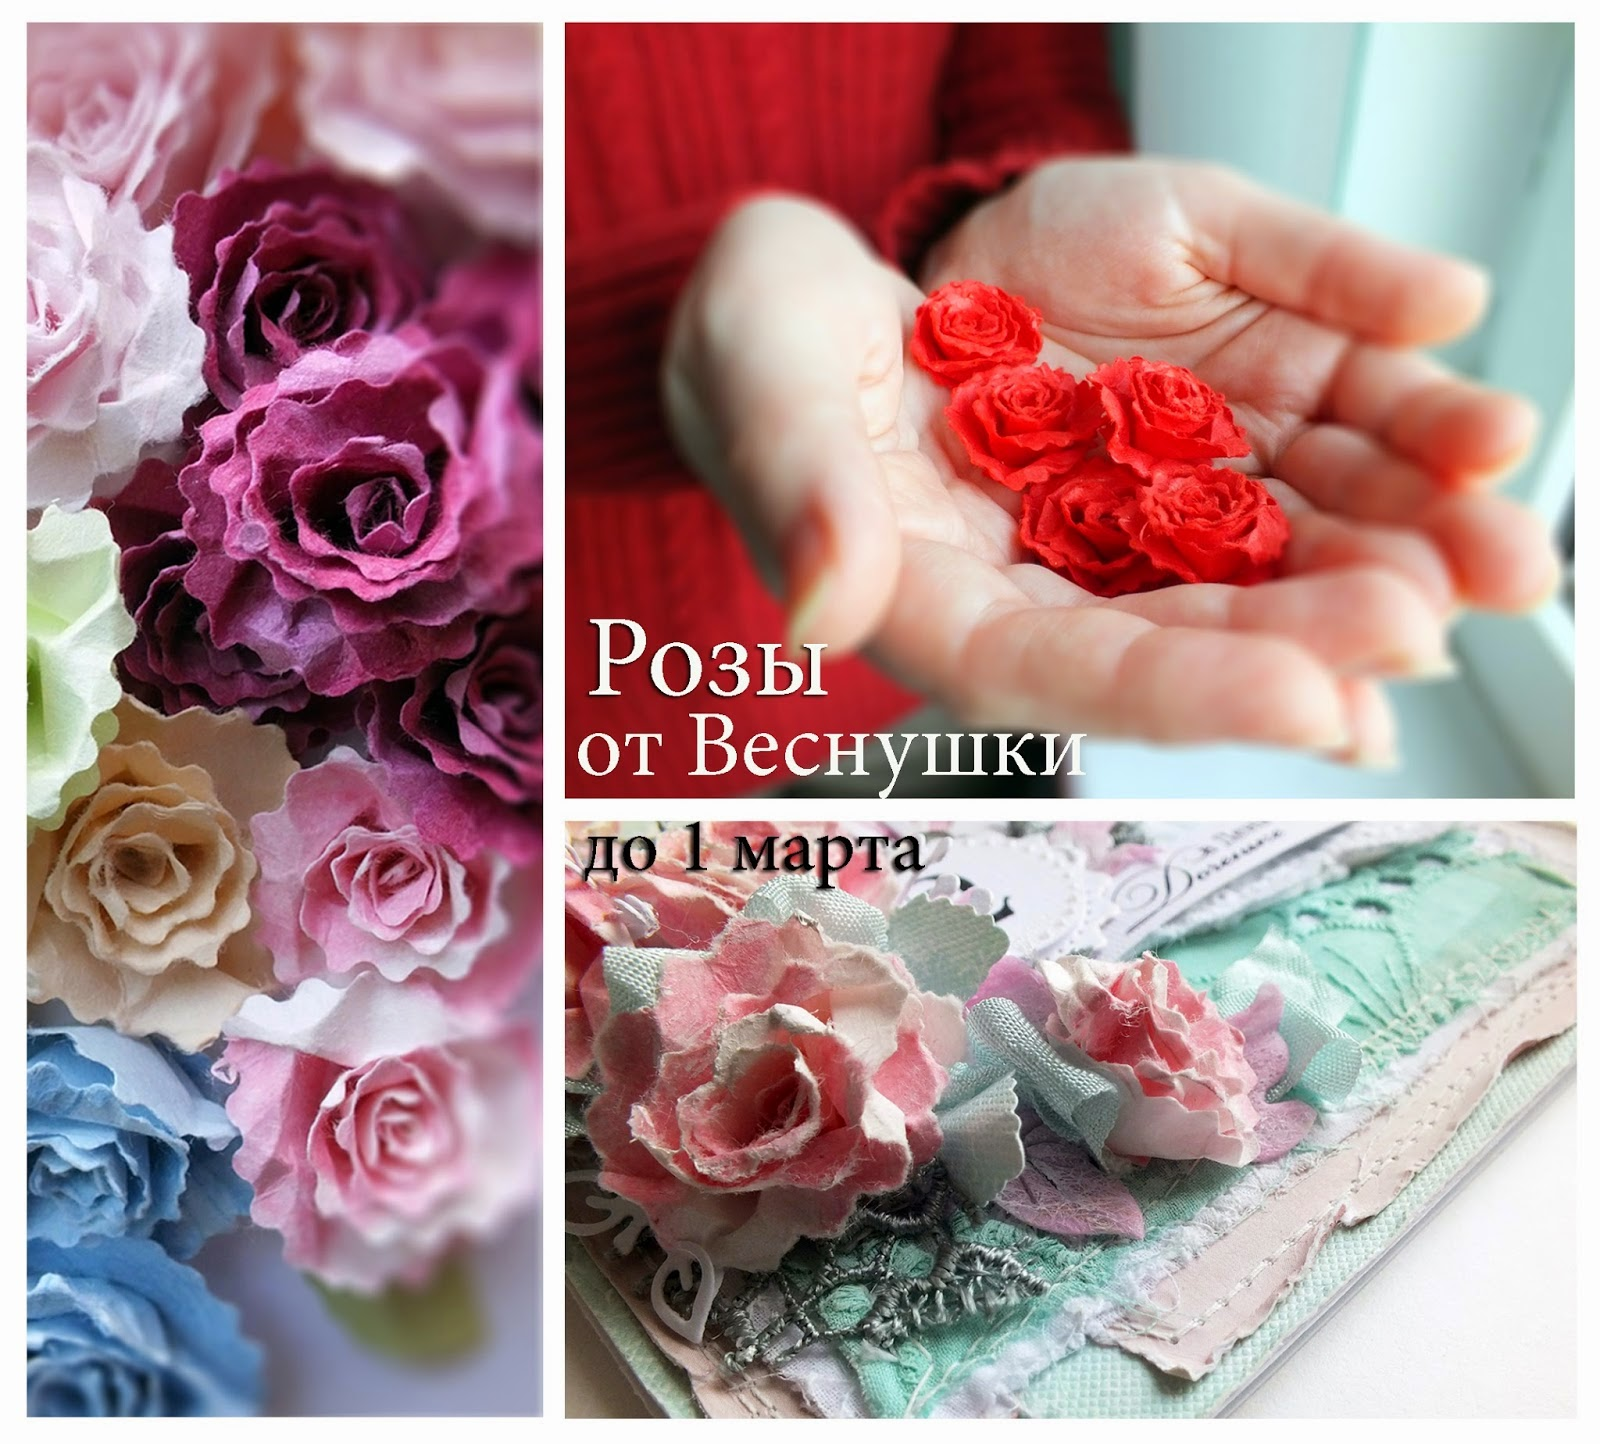 Розы от Веснушки